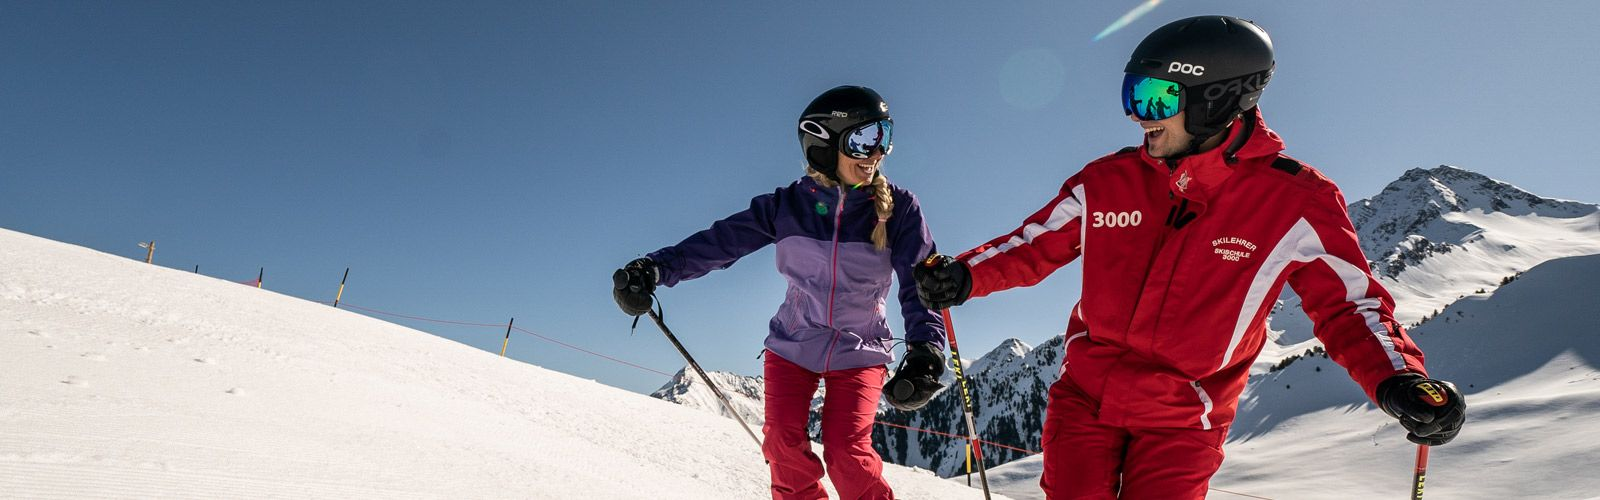 Private skikurse gruppenkurse carving kurse skischule